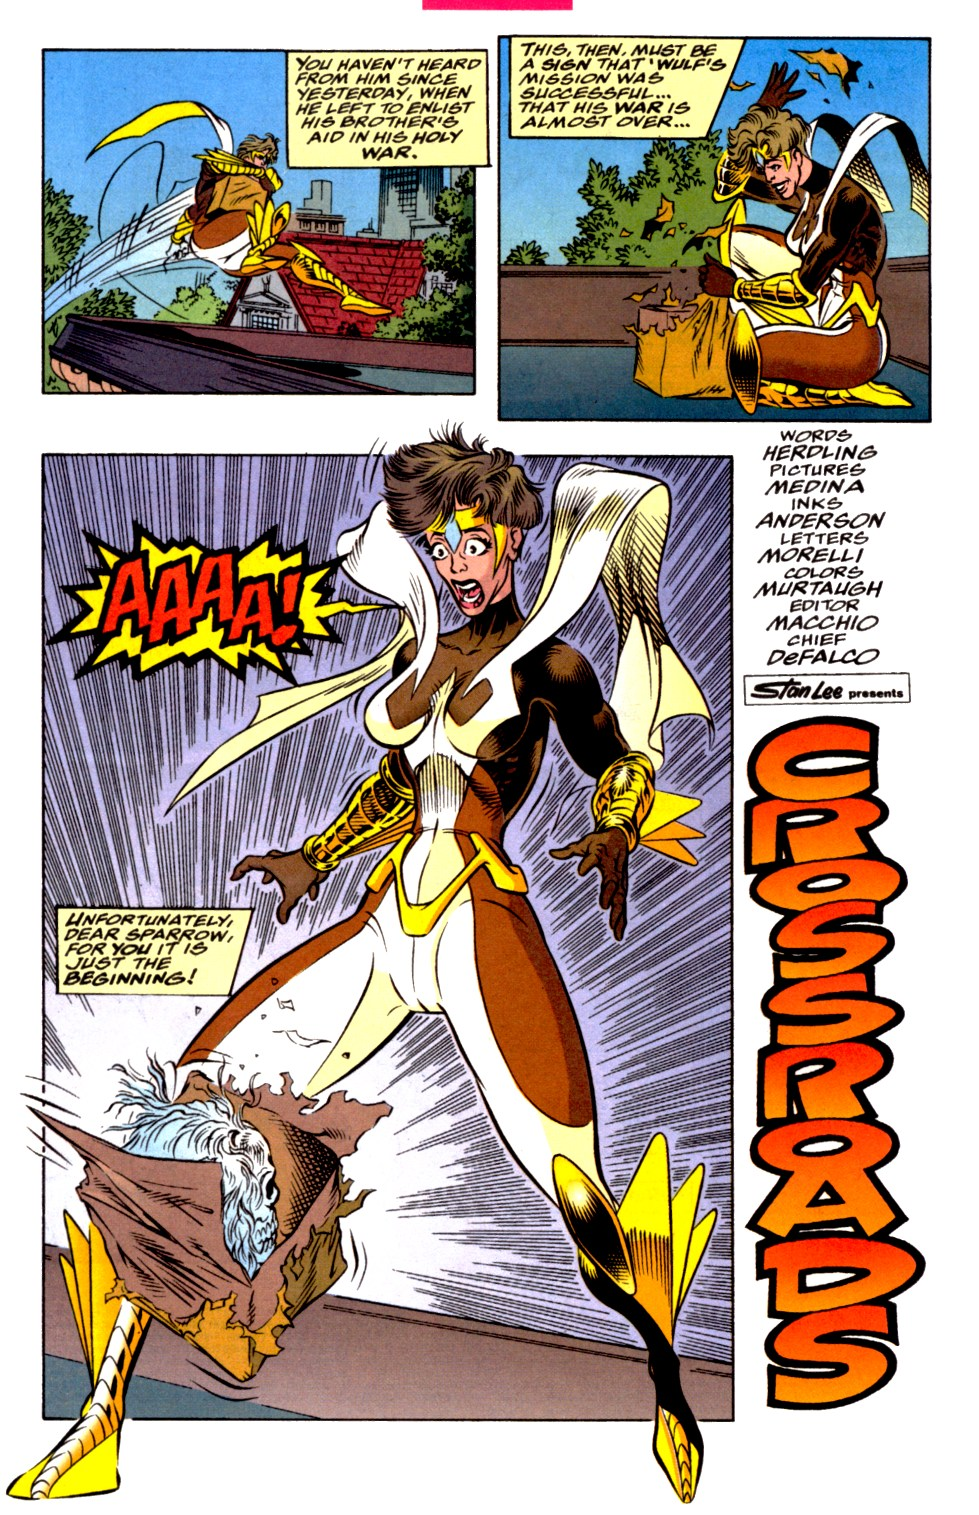 Read online Blackwulf comic -  Issue #2 - 3